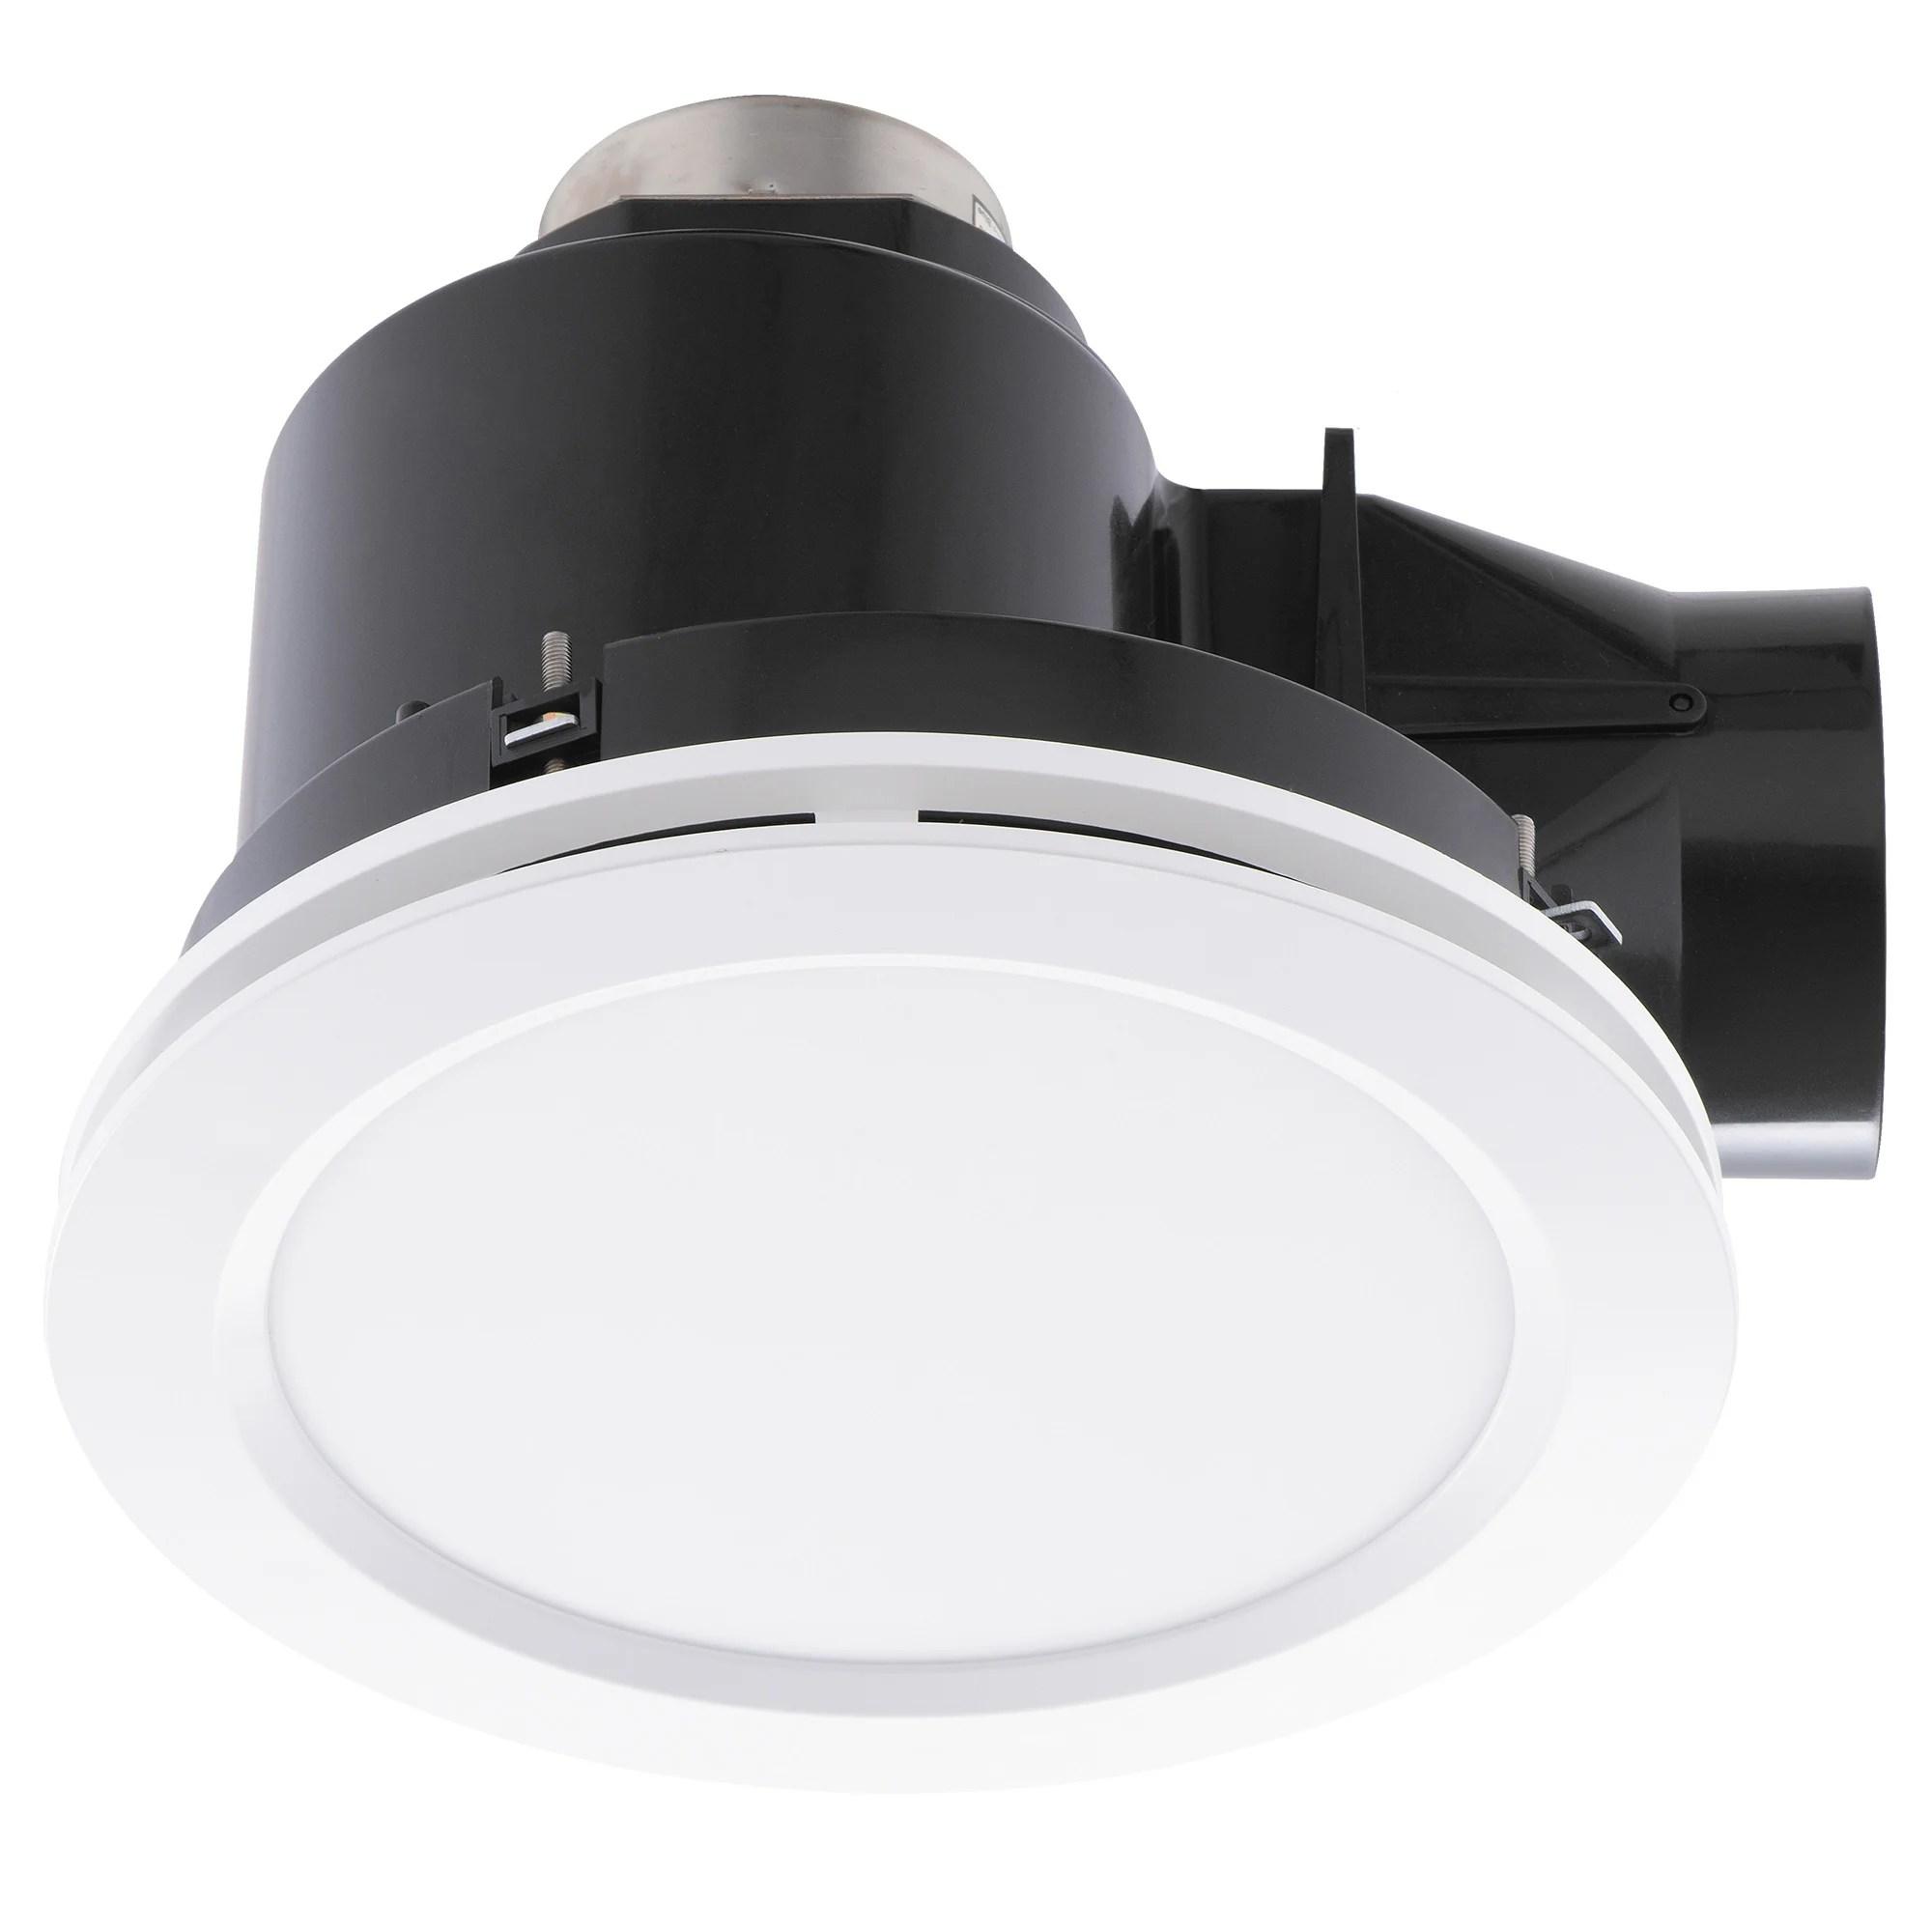 revoline white small bathroom exhaust fan with tri colour light